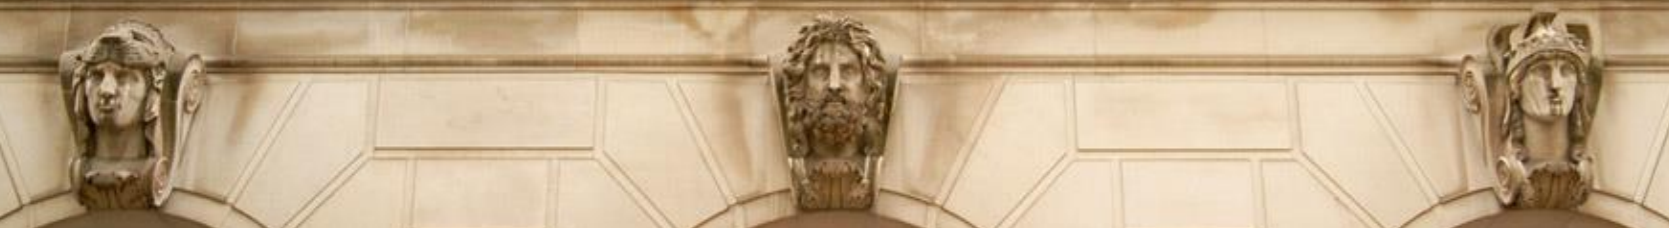 Architecture, Photograph, Sculpture, Beard